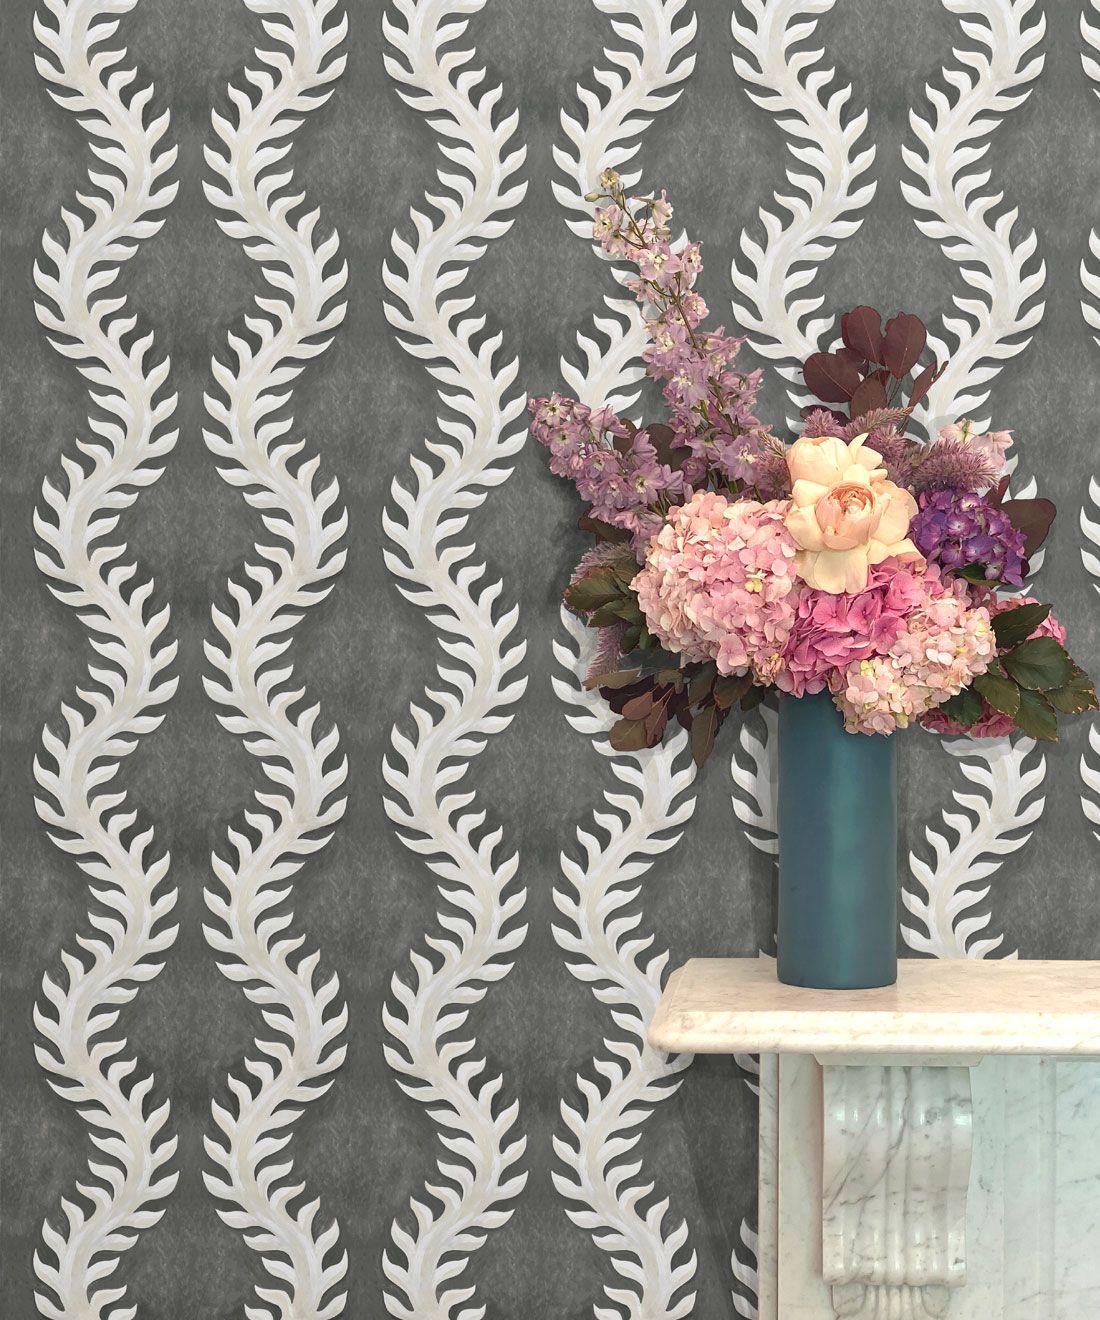 Fern Wallpaper • Gray Wallpaper •Insitu with flowers